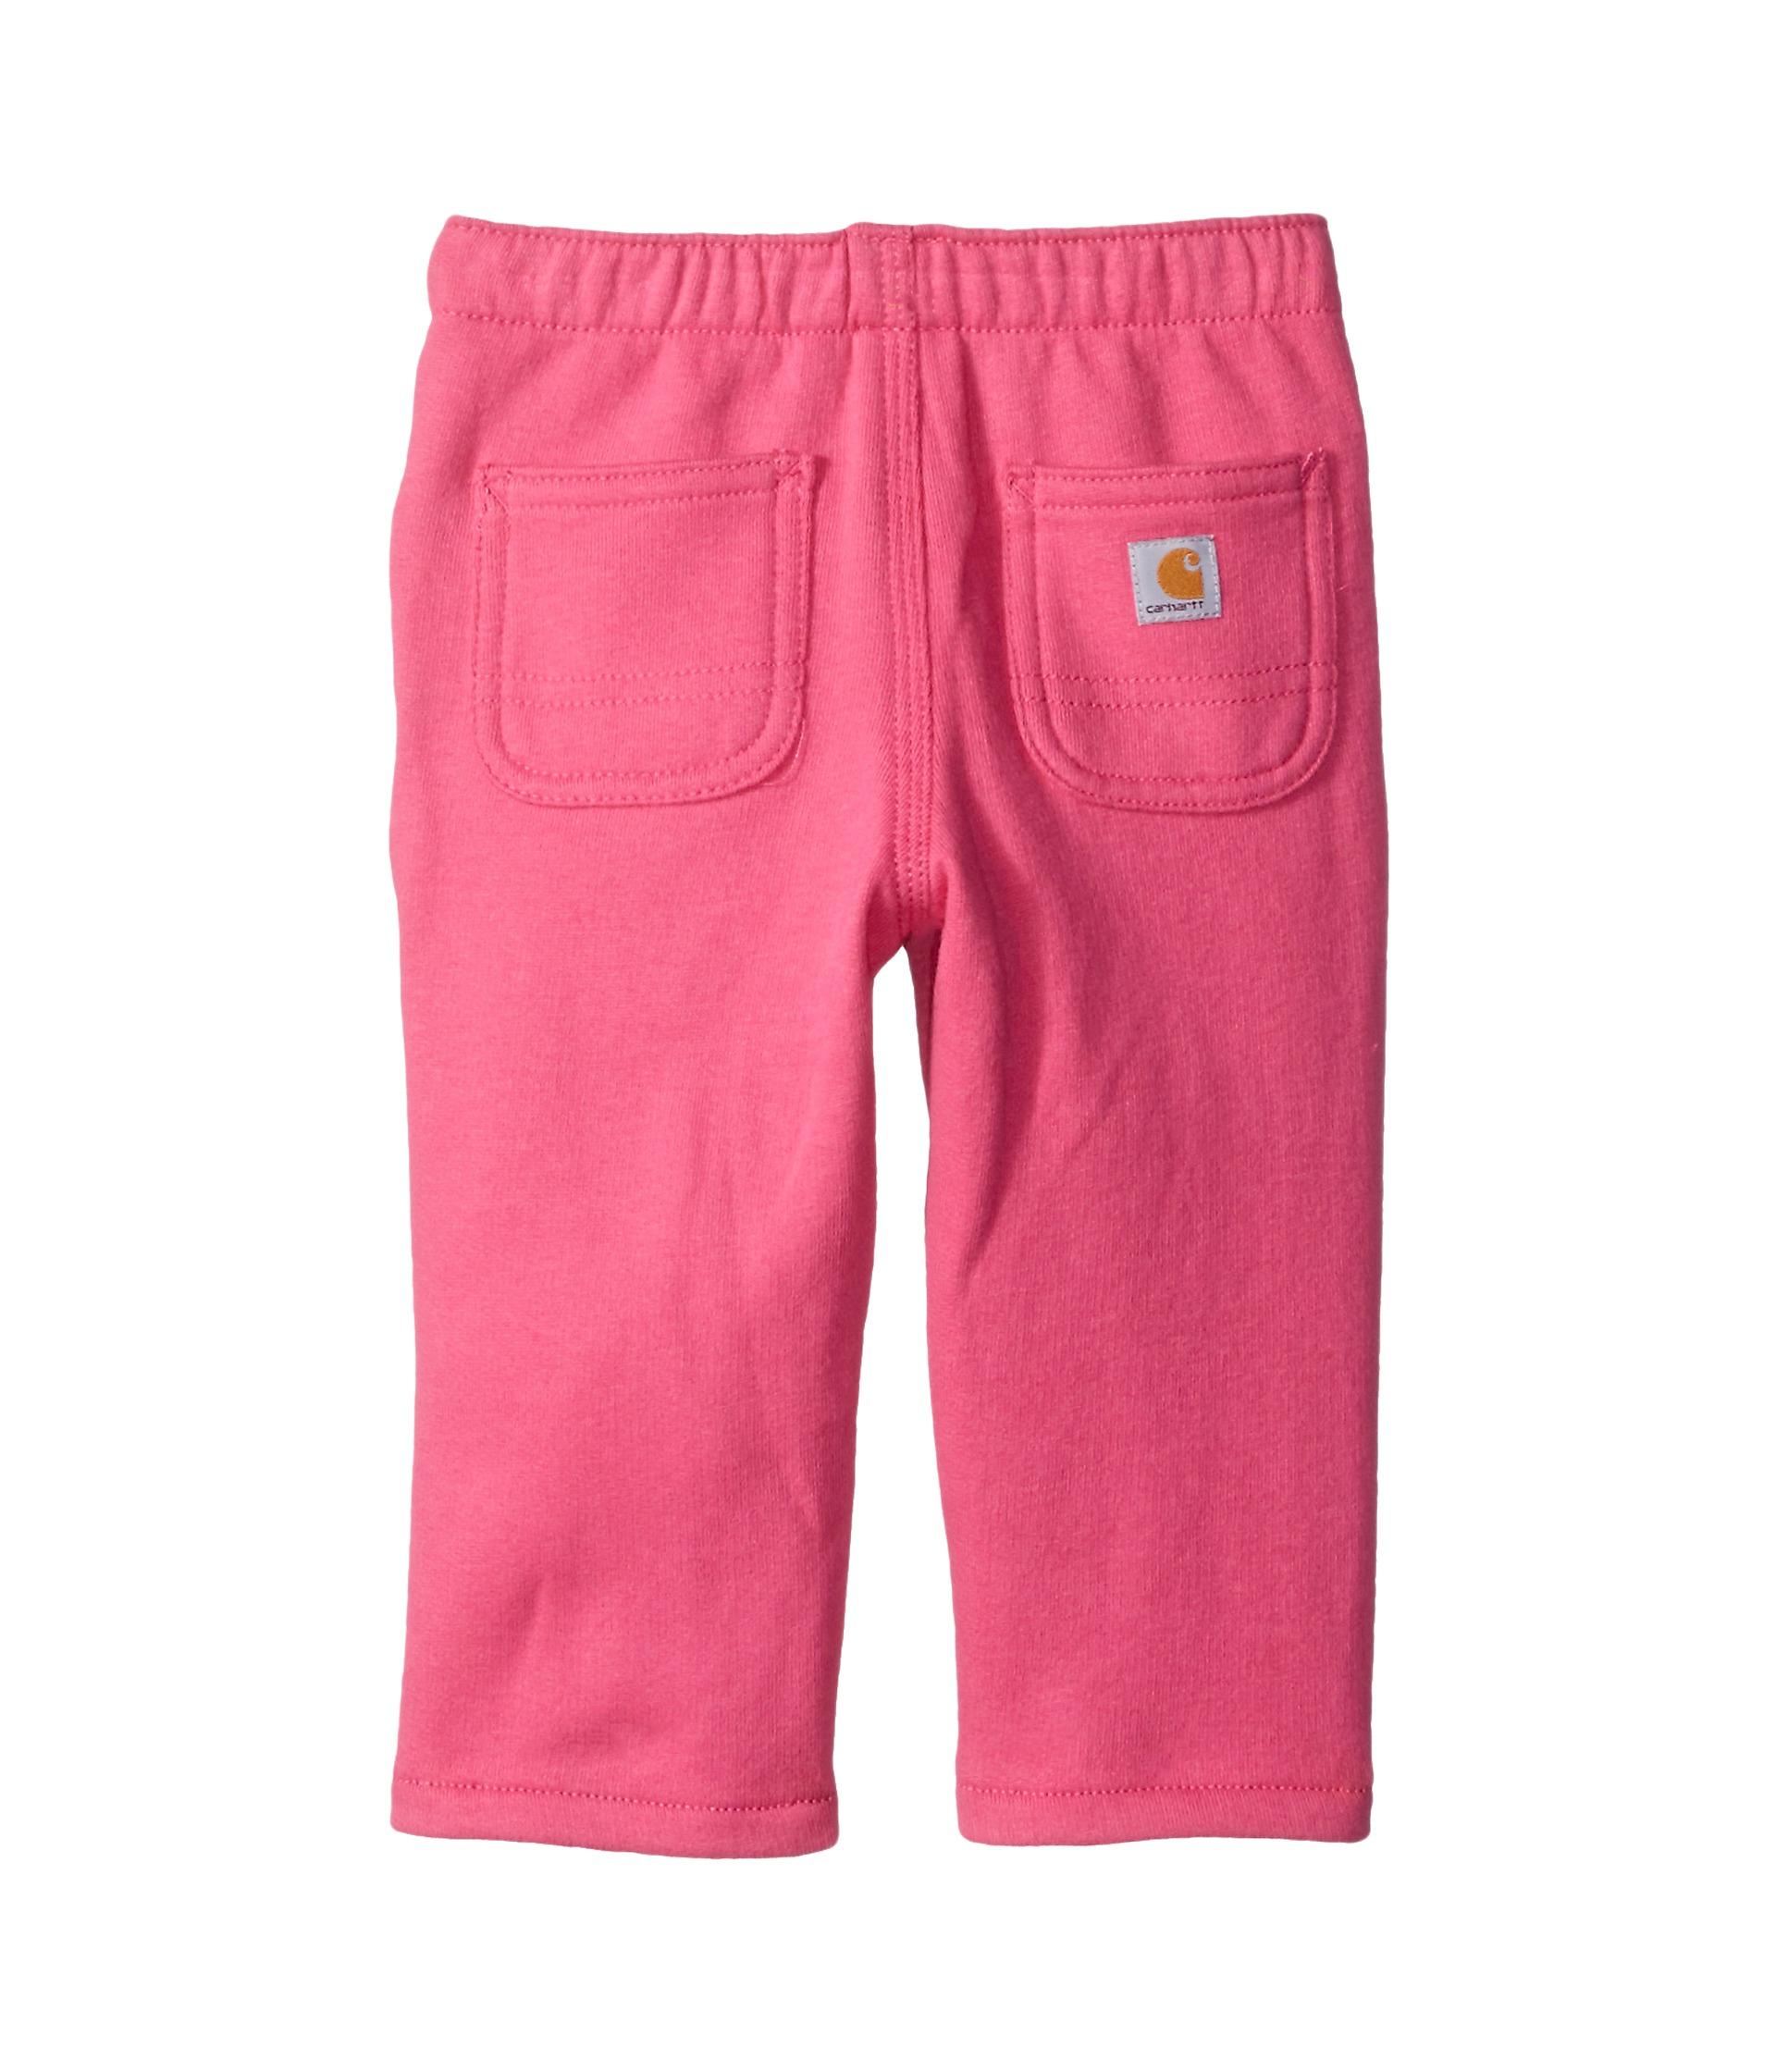 Carhartt Kids Flower Power Three Piece Pants Set Infant